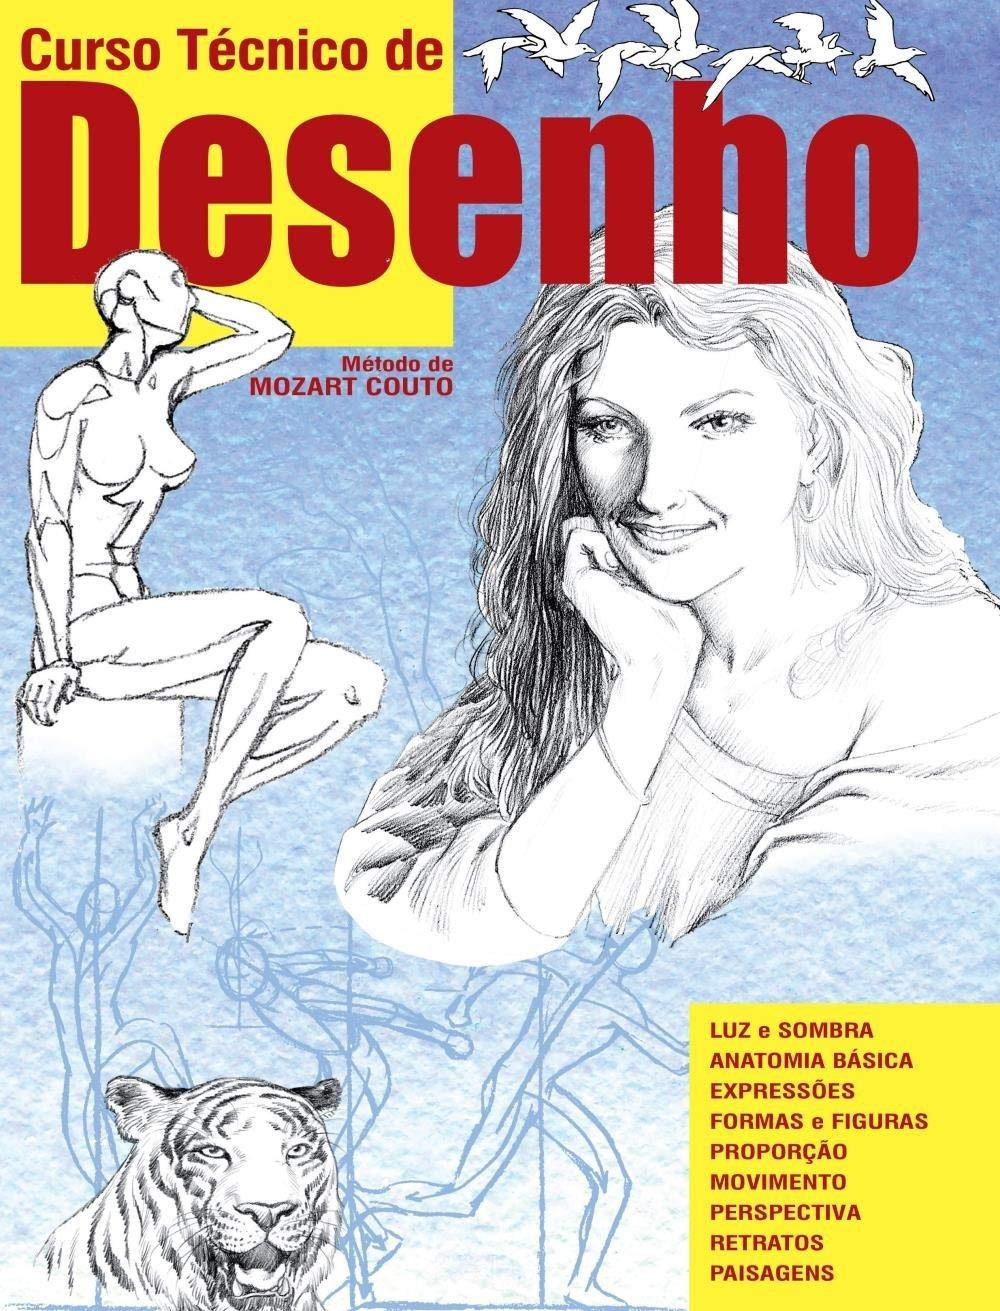 Curso Técnico de Desenho - 7897763476073 - Livros na Amazon Brasil